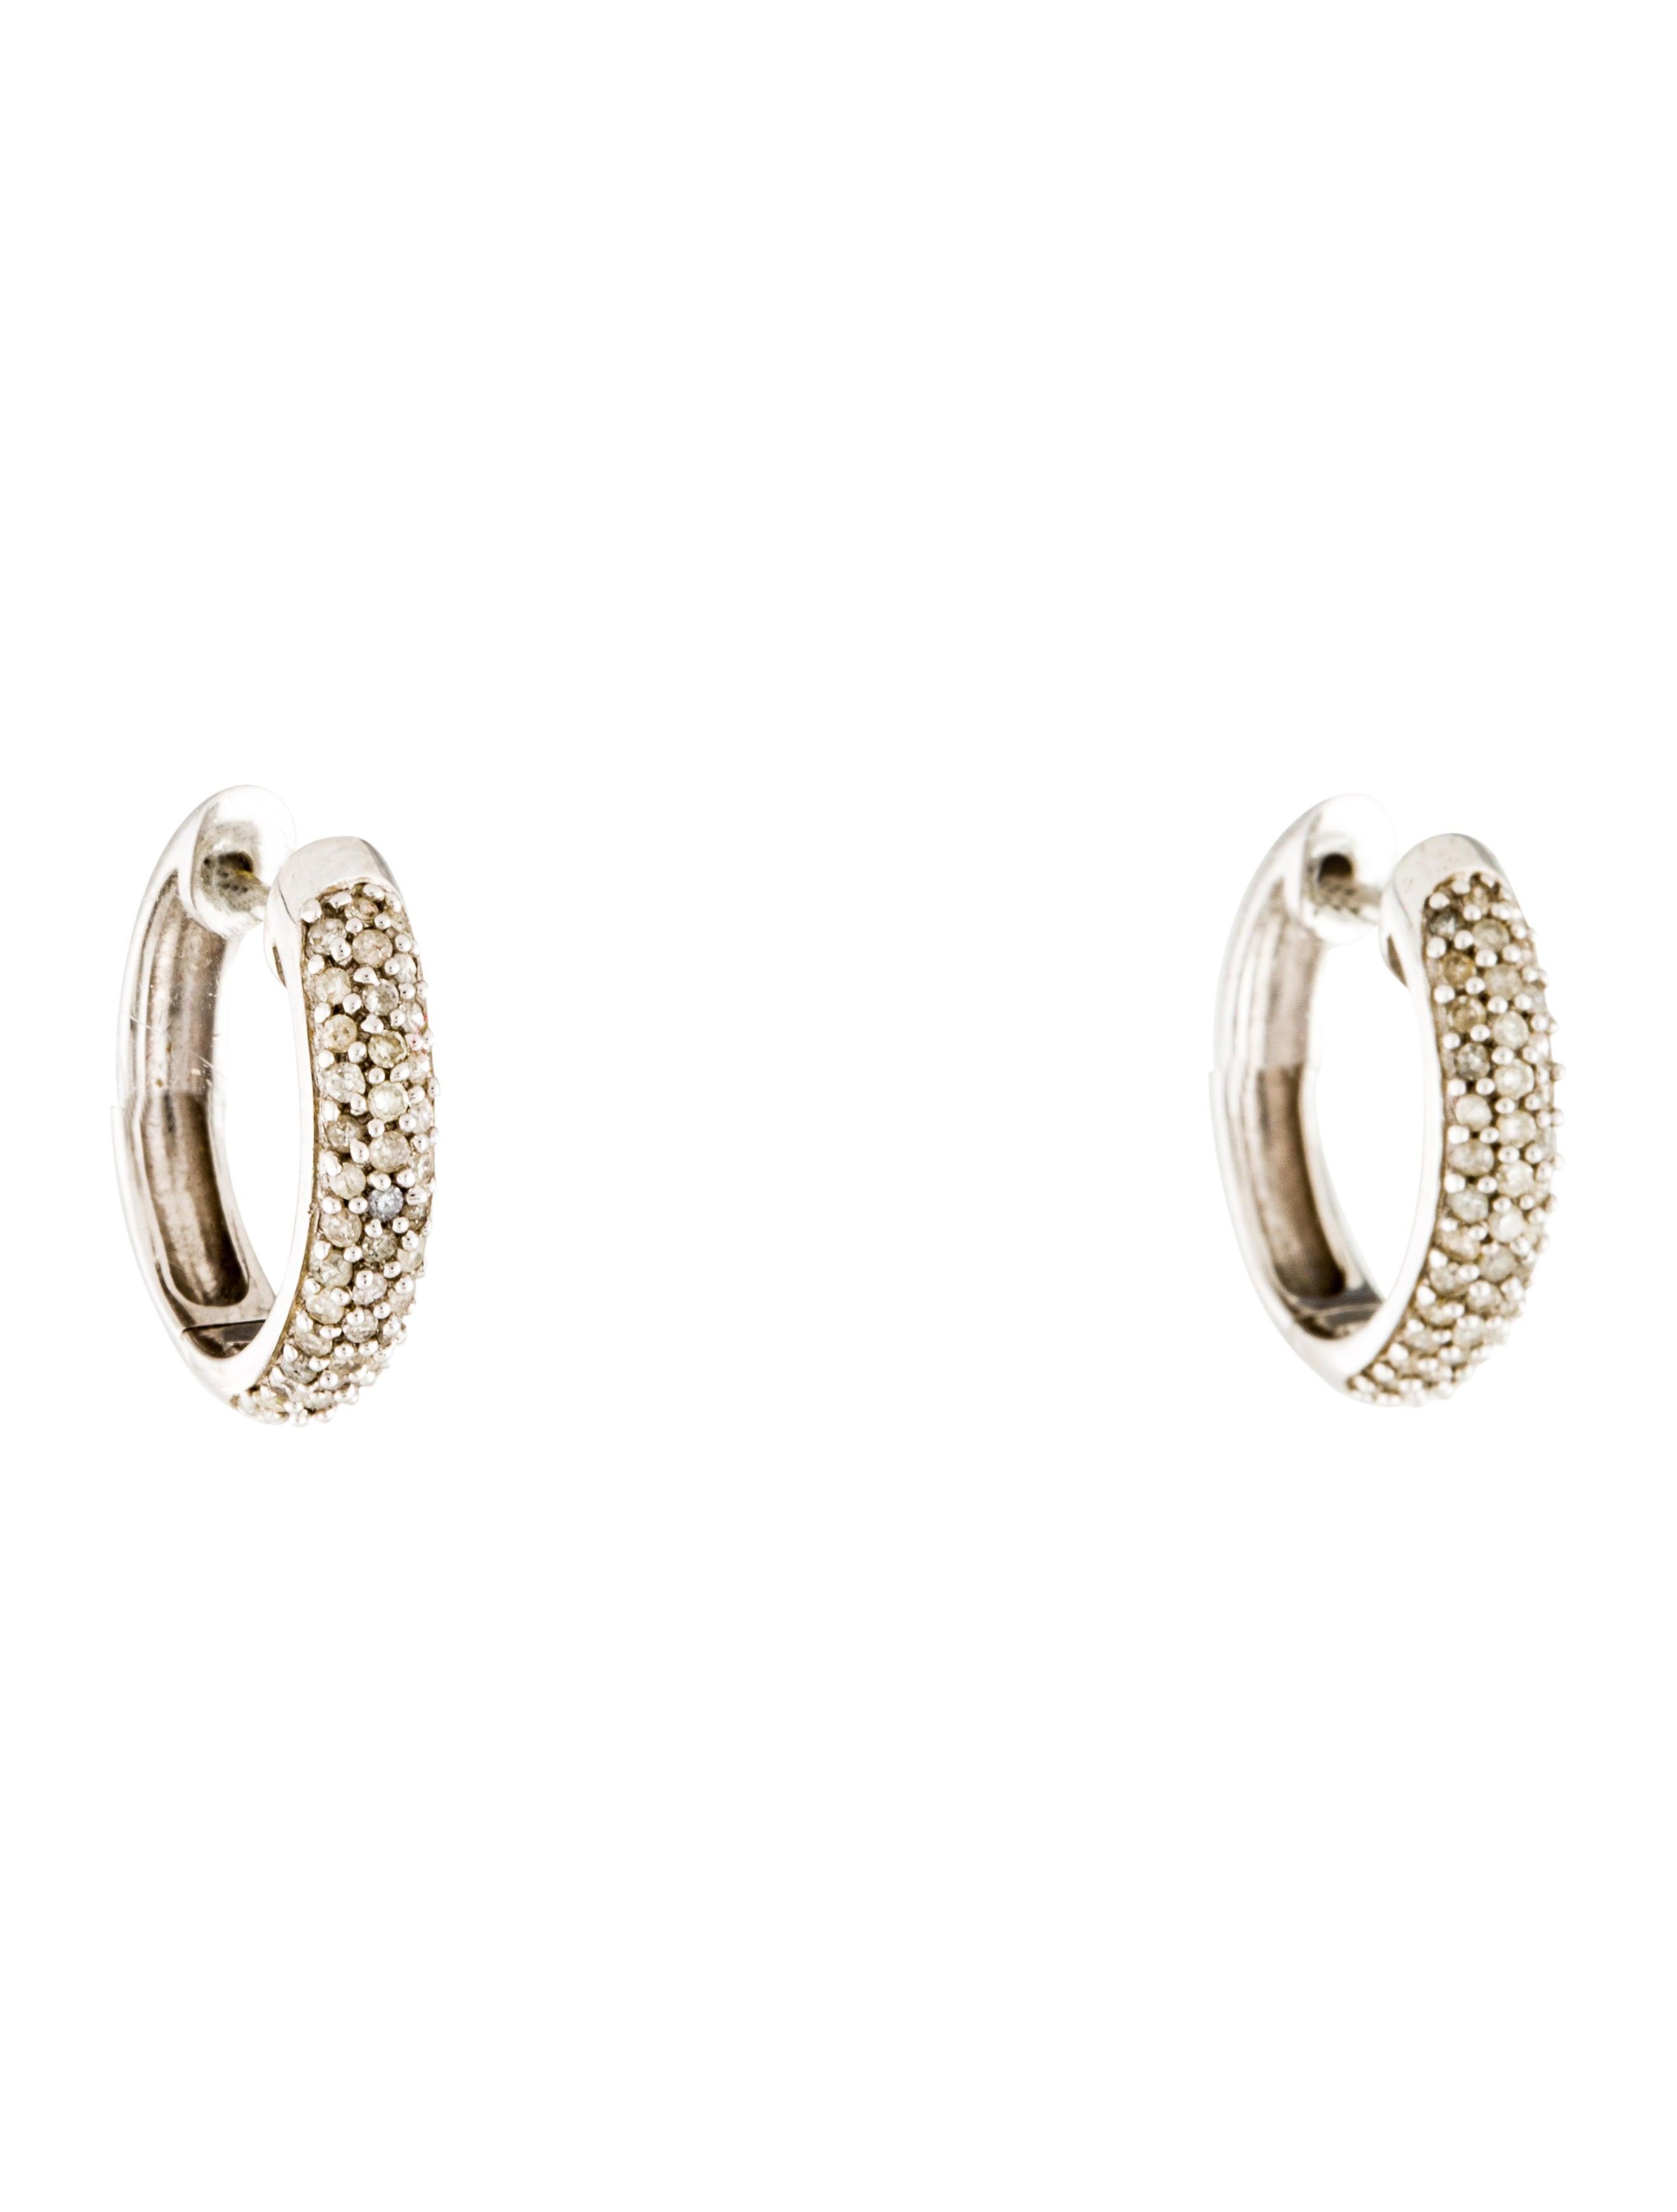 4ef985694 Michael Kors Brilliance Statement Pavé Crossover Hoop Earrings ...